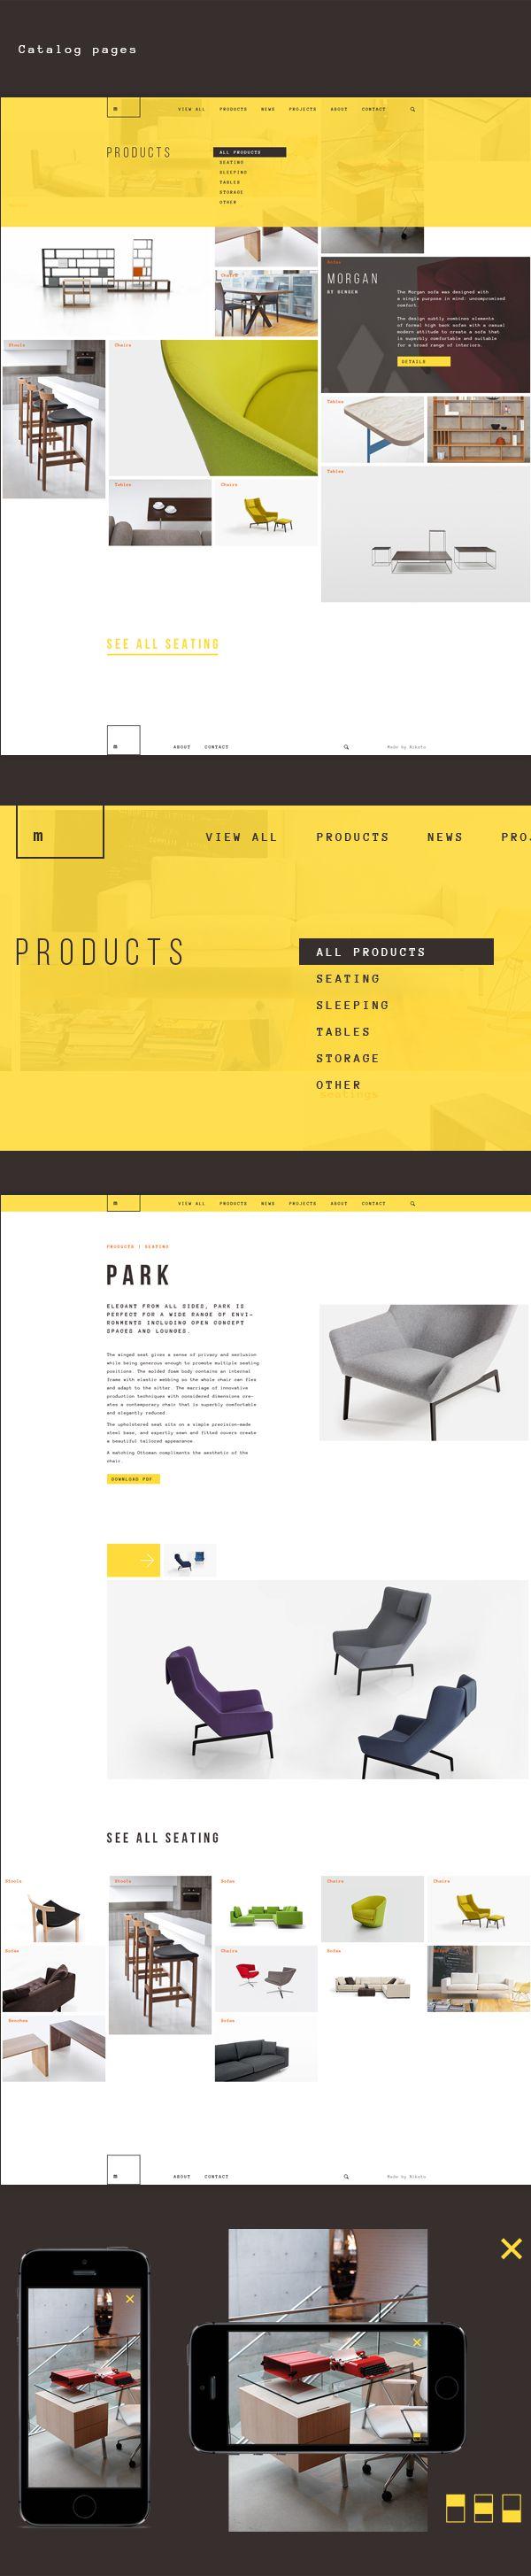 http://www.webdesignserved.com/gallery/Monospace-identity-website/17068621